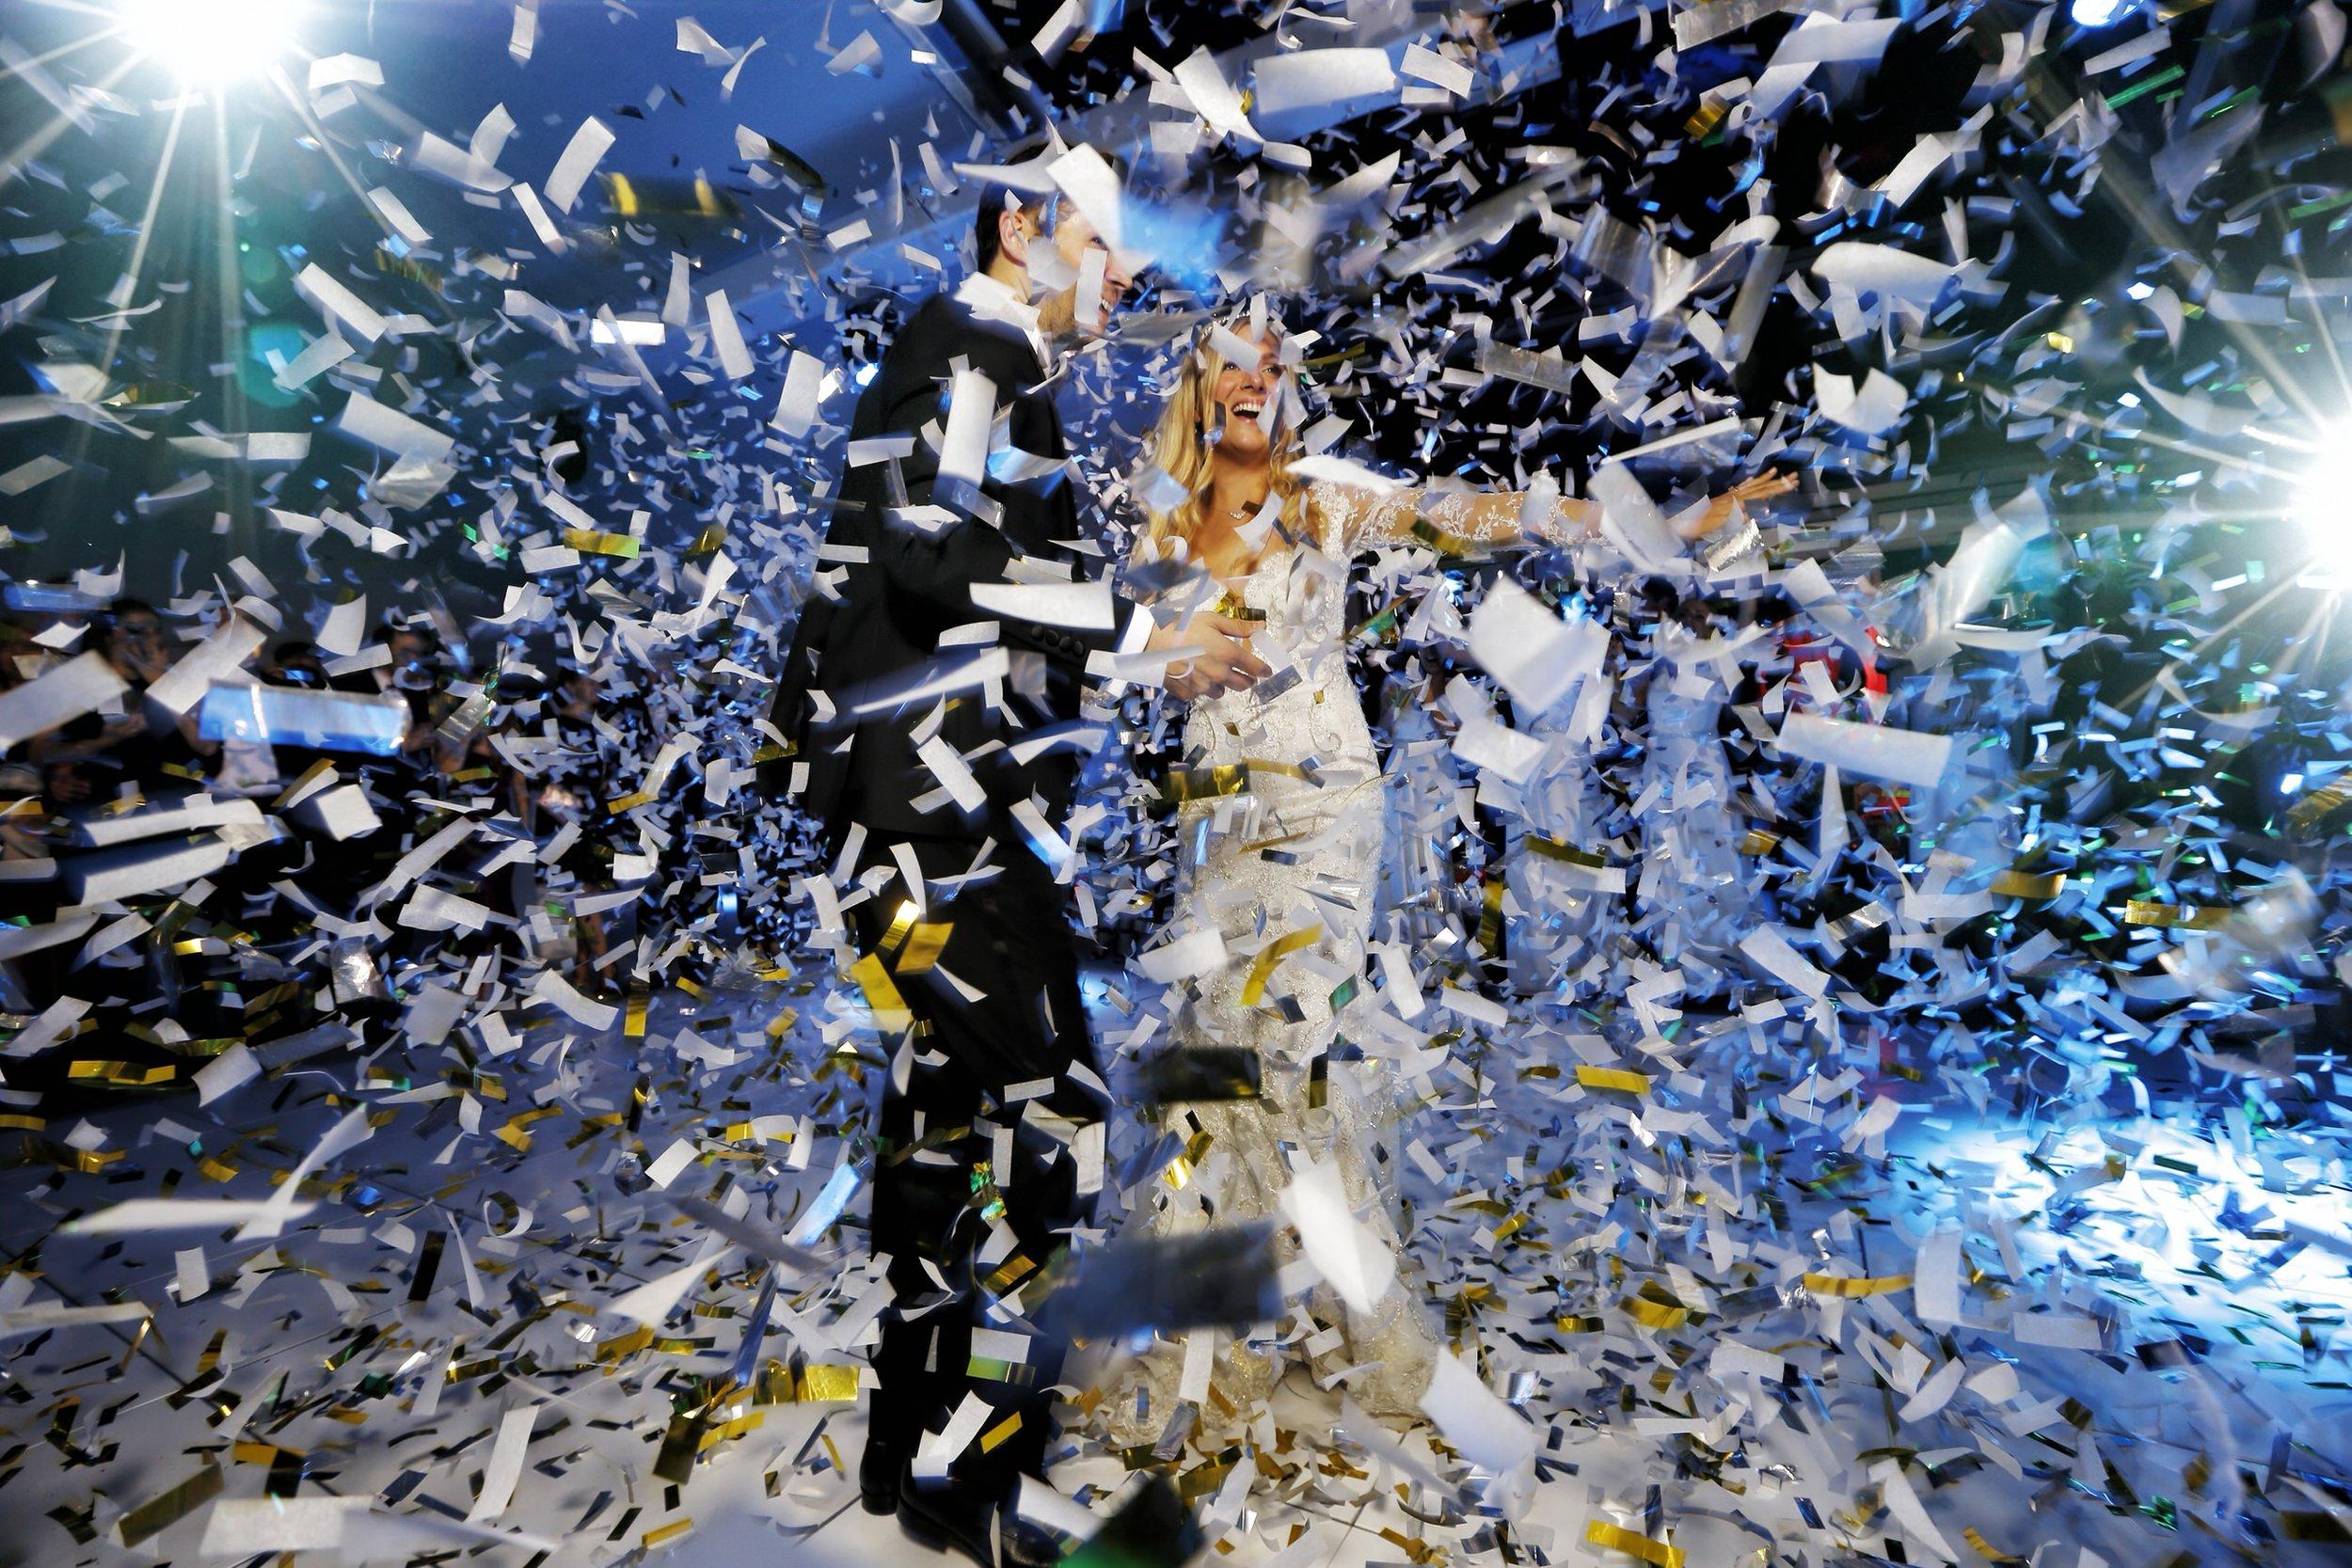 brett-harkness-winter-wedding-uk-wedding-photographer_0021.jpg